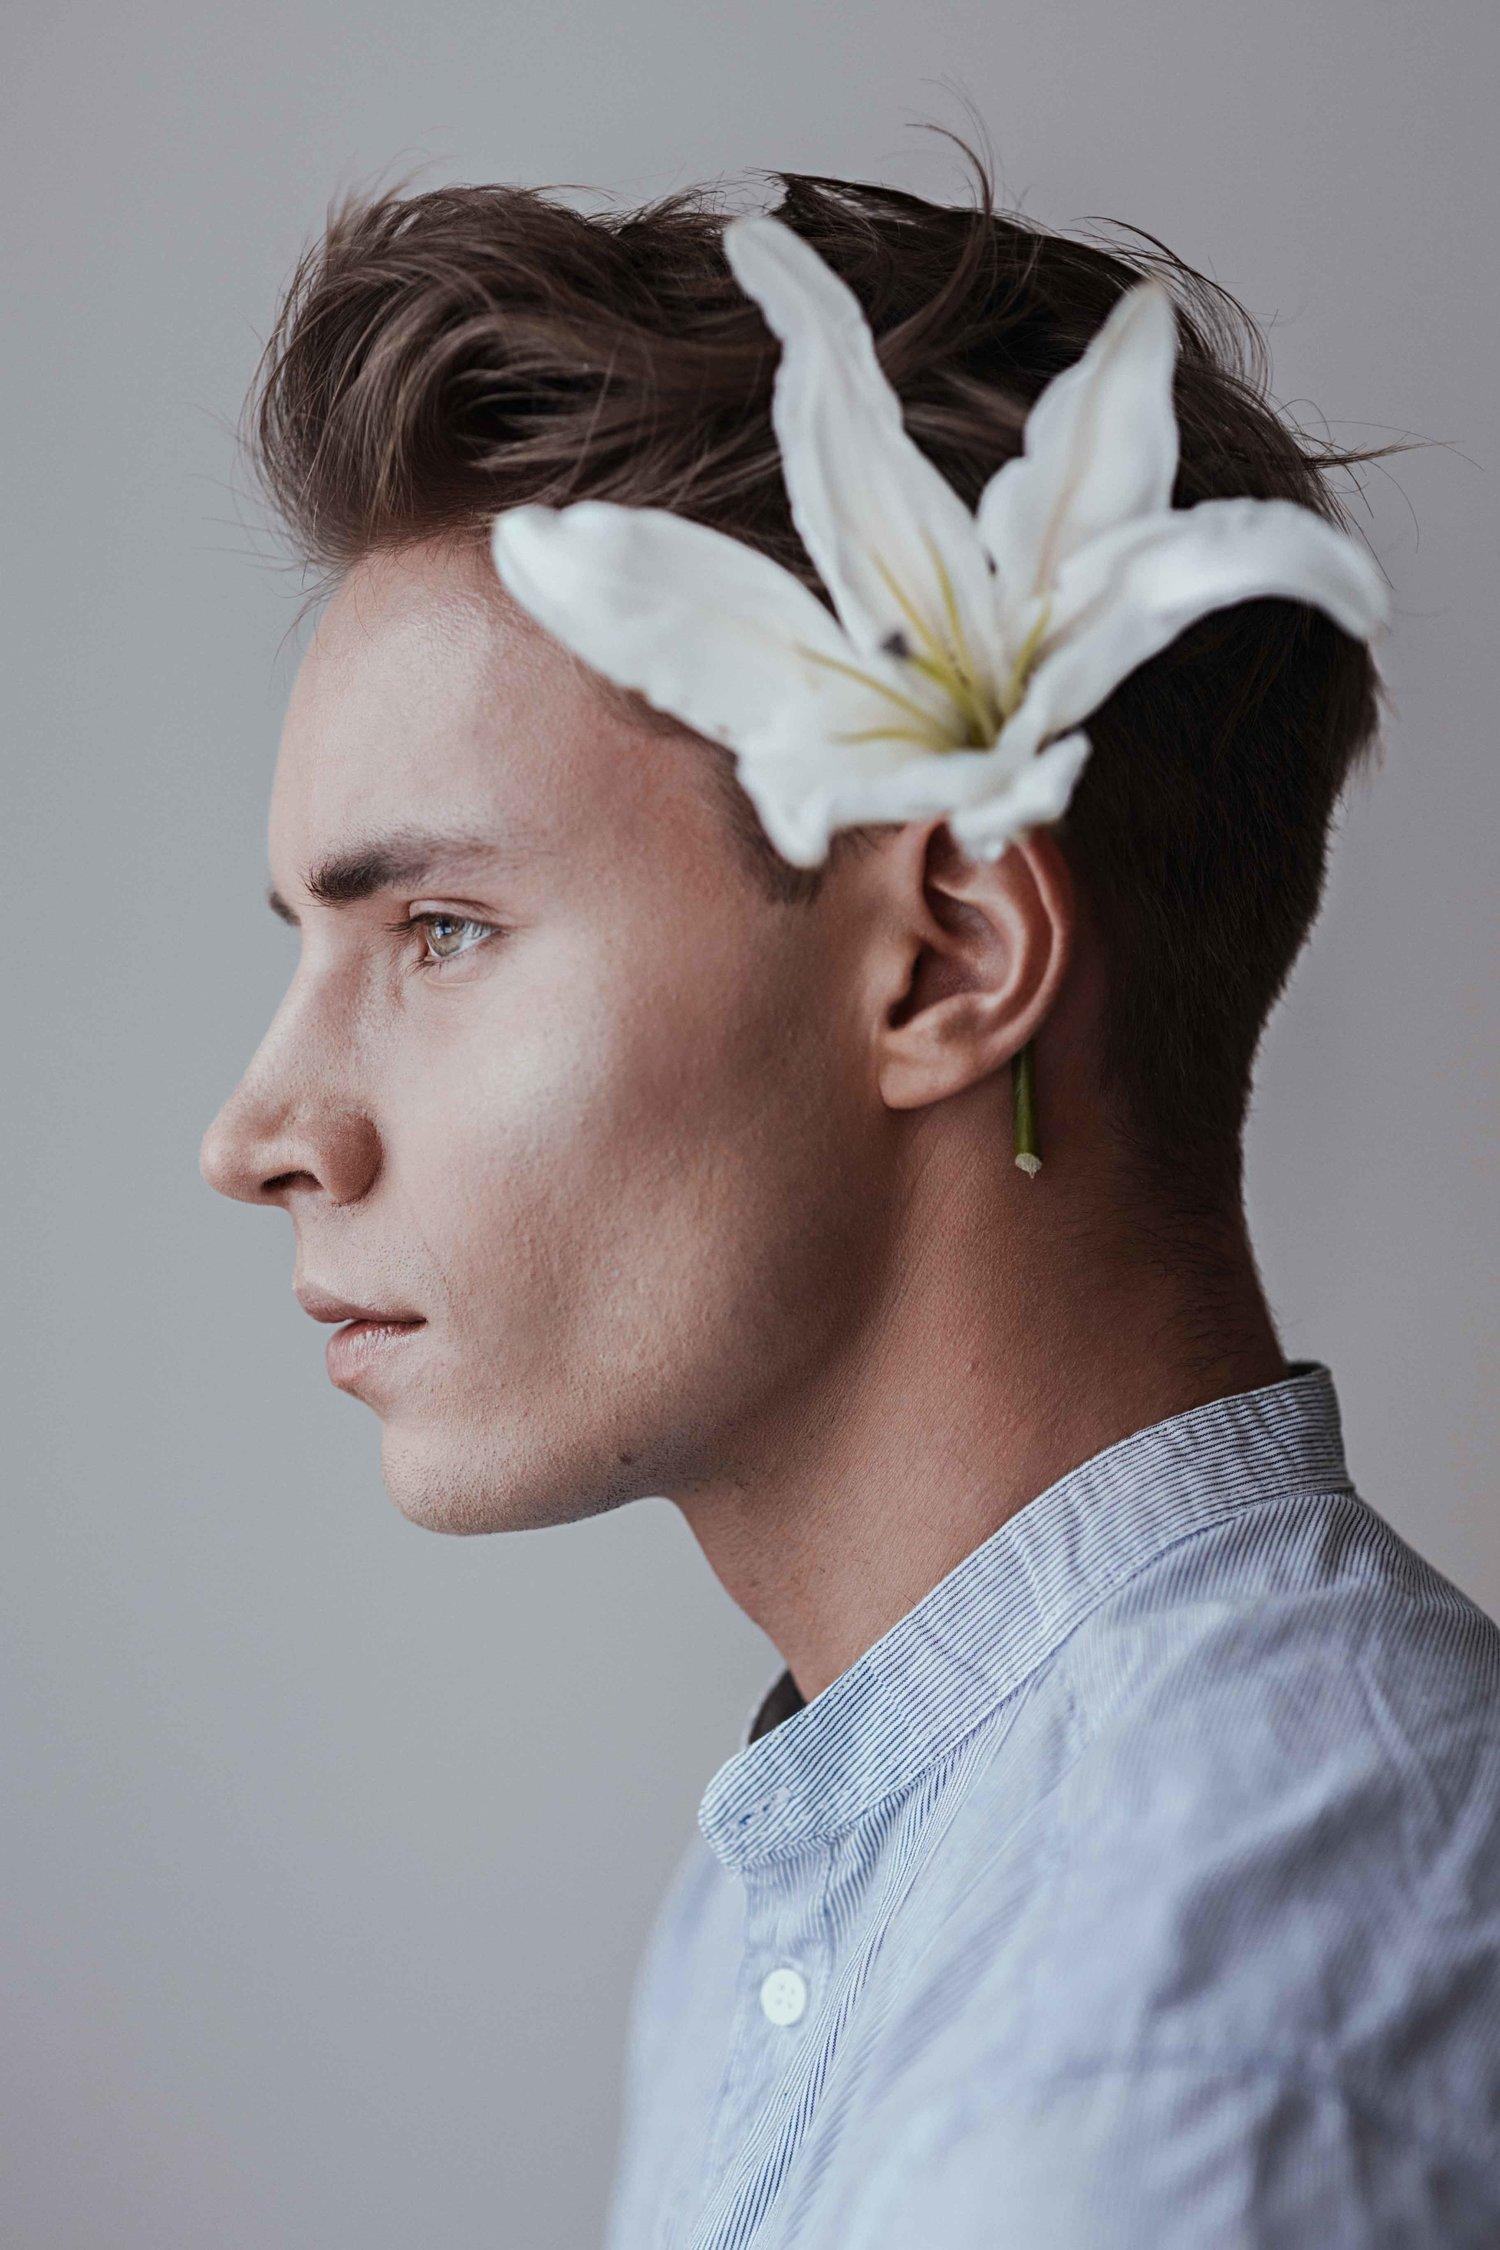 Adon Exclusive: Model Alex Sherlygin By Pavel Lepikhin